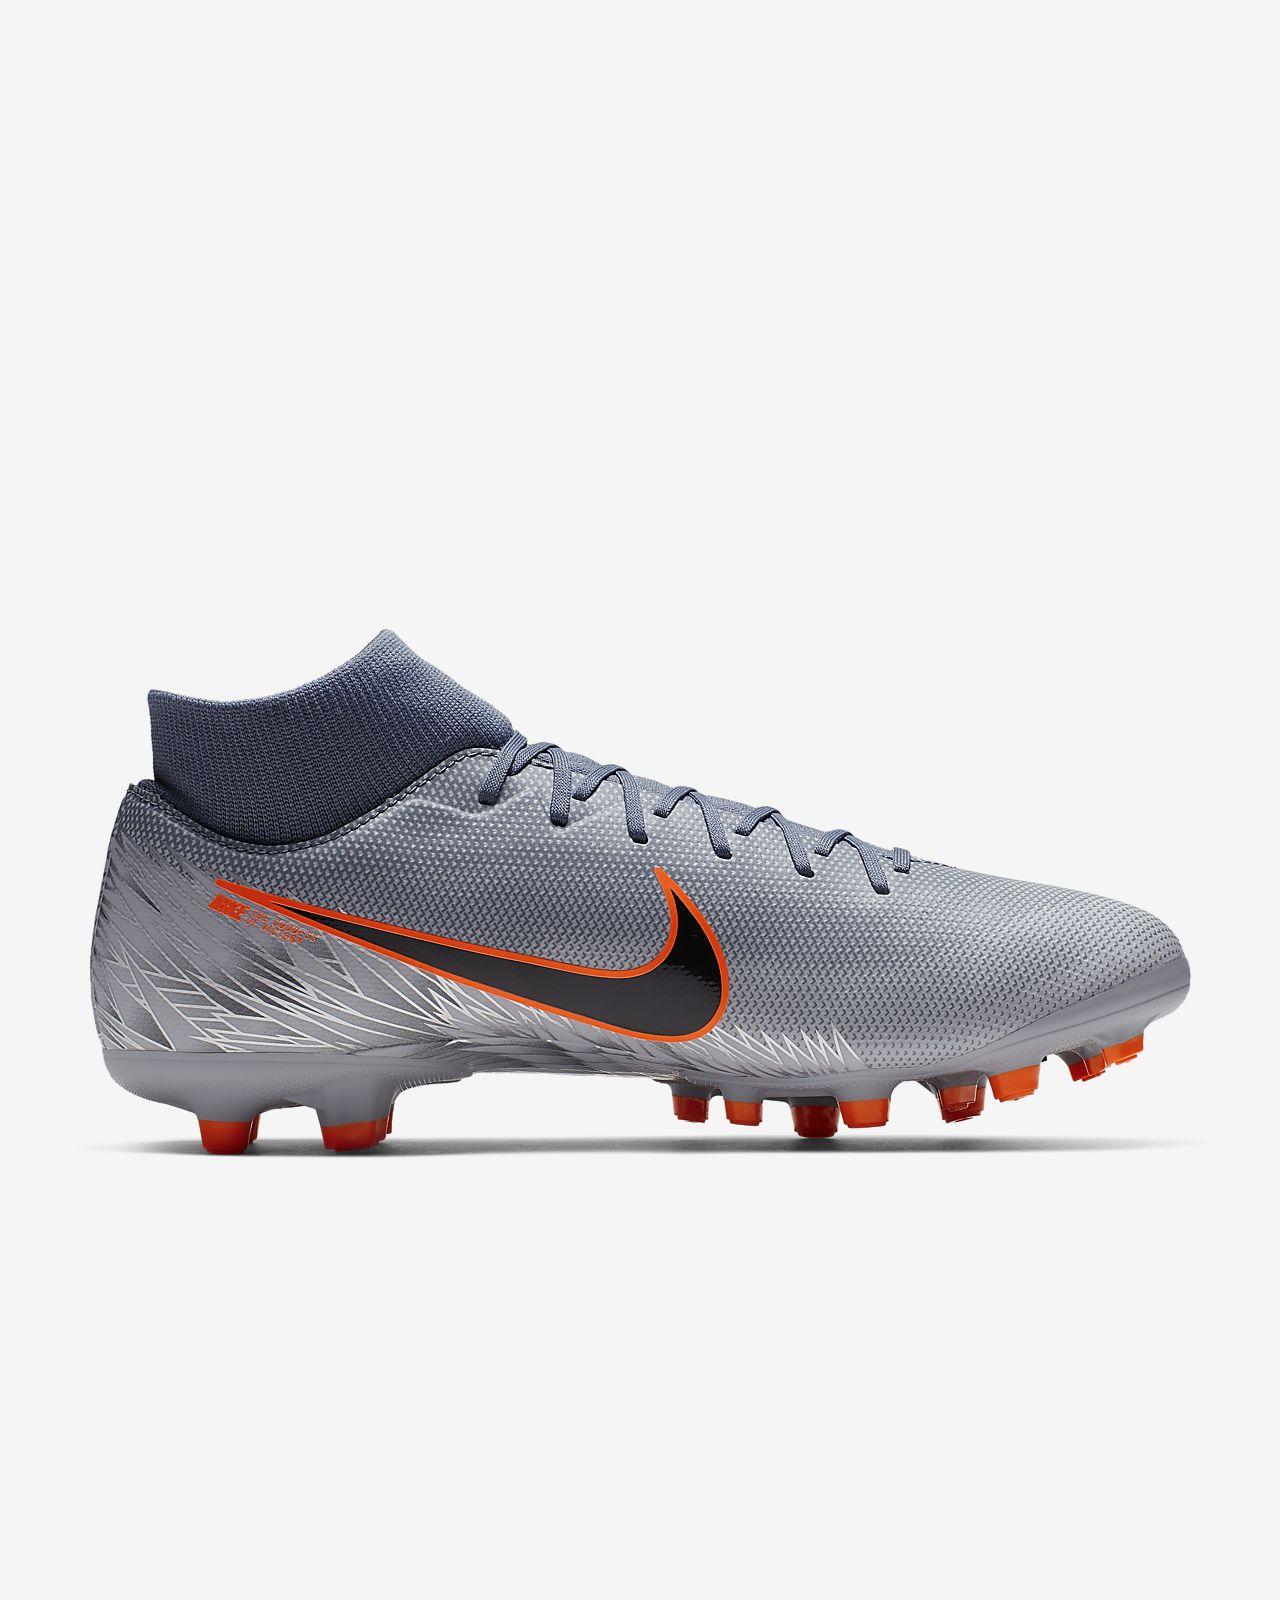 146c7b2c ... Футбольные бутсы для игры на разных покрытиях Nike Mercurial Superfly 6  Academy MG